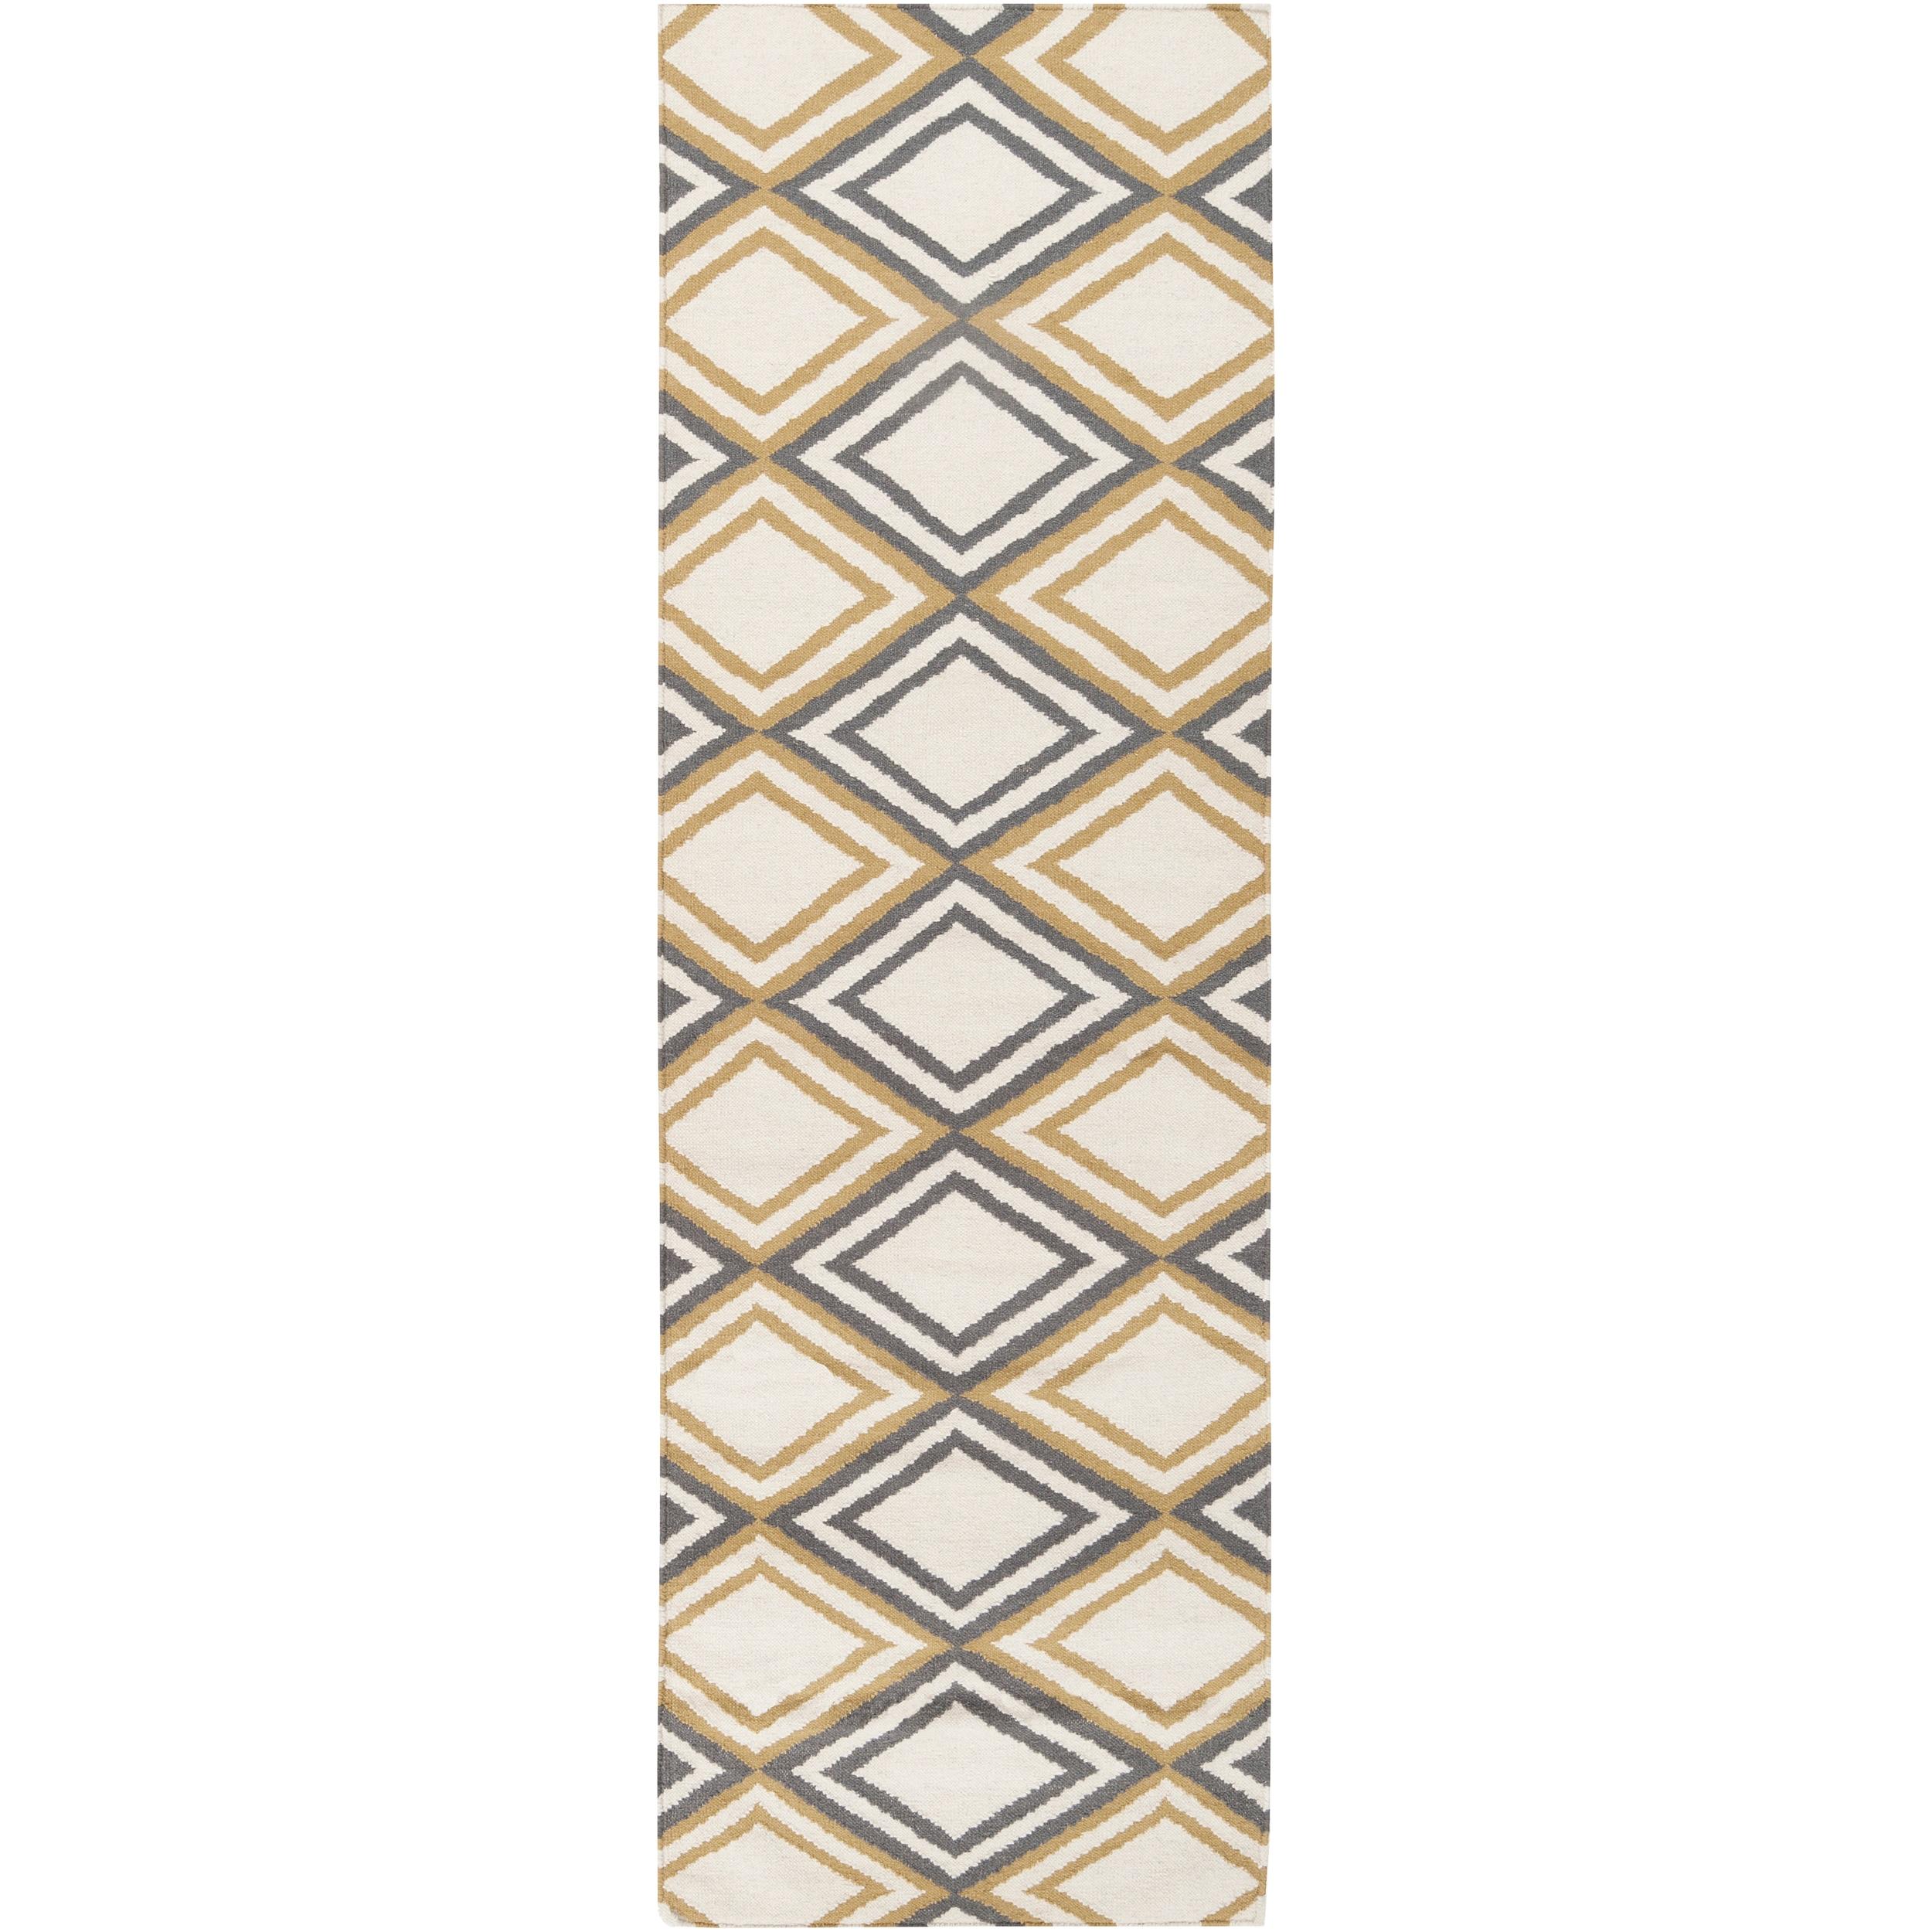 Hand-woven Caroni 'Brown' Wool Area Rug - 2'6 x 8'